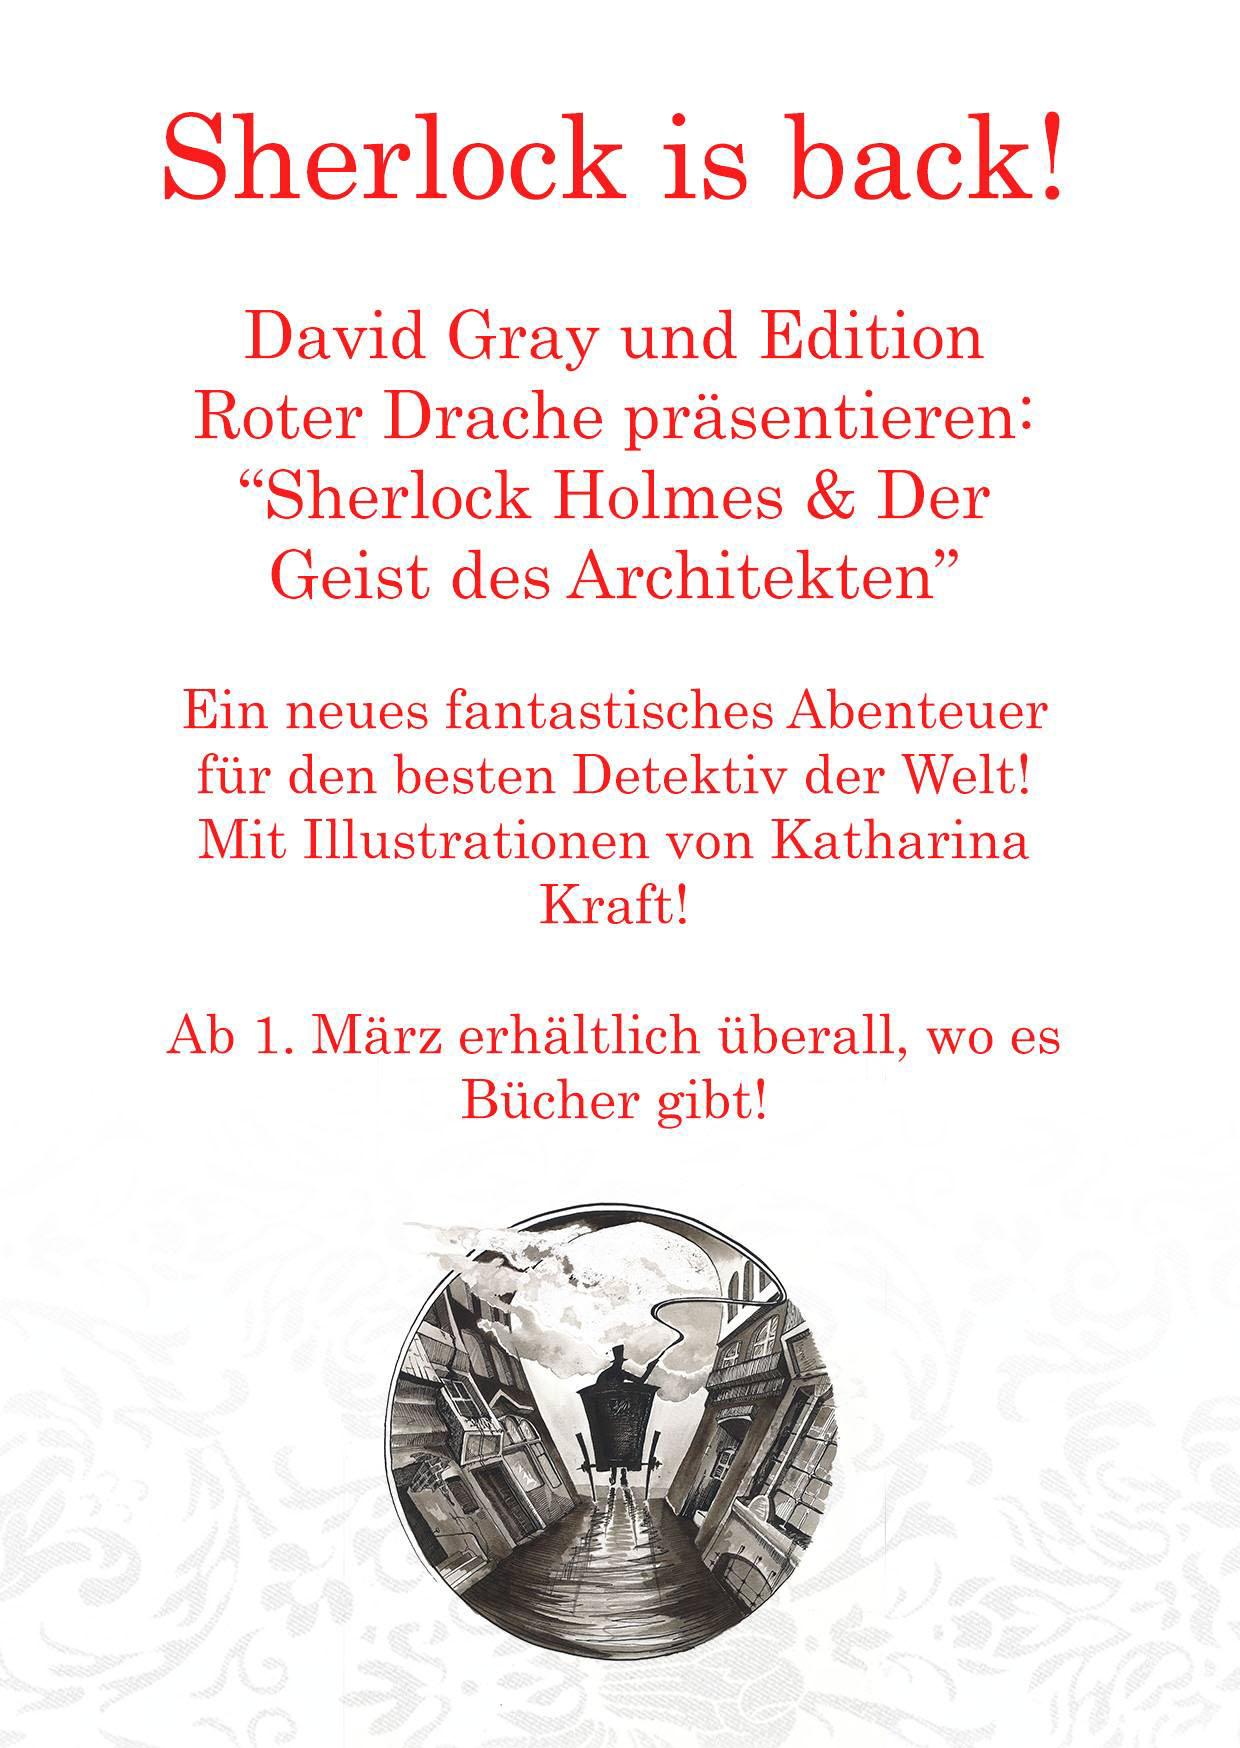 David Gray: Der neue Kriminalroman!